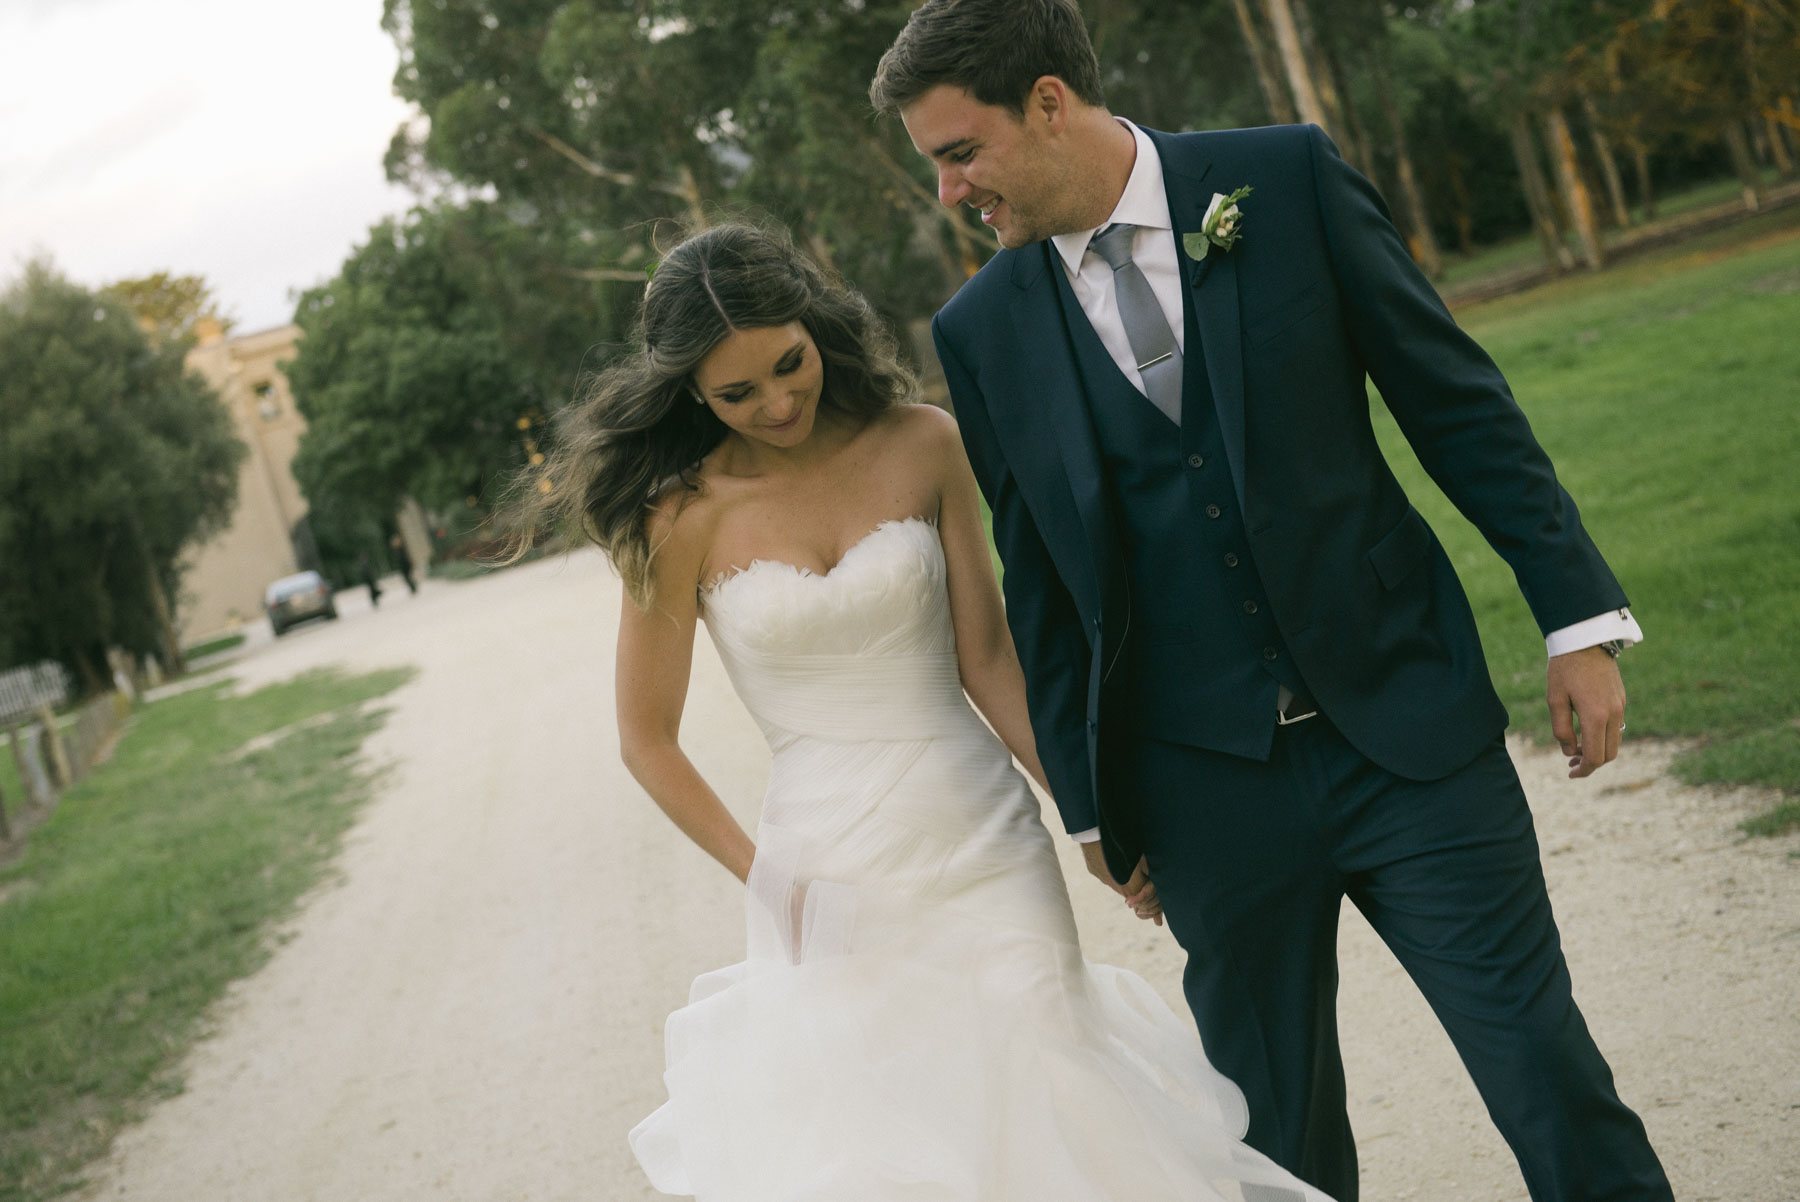 1501vand-380alan_moyle_wedding_portrait_brighton_bayside_werribee_estate_mansion_zoo_rustic_styled_garden_mansion_candid_documentry_victoria_whitelaw.jpg